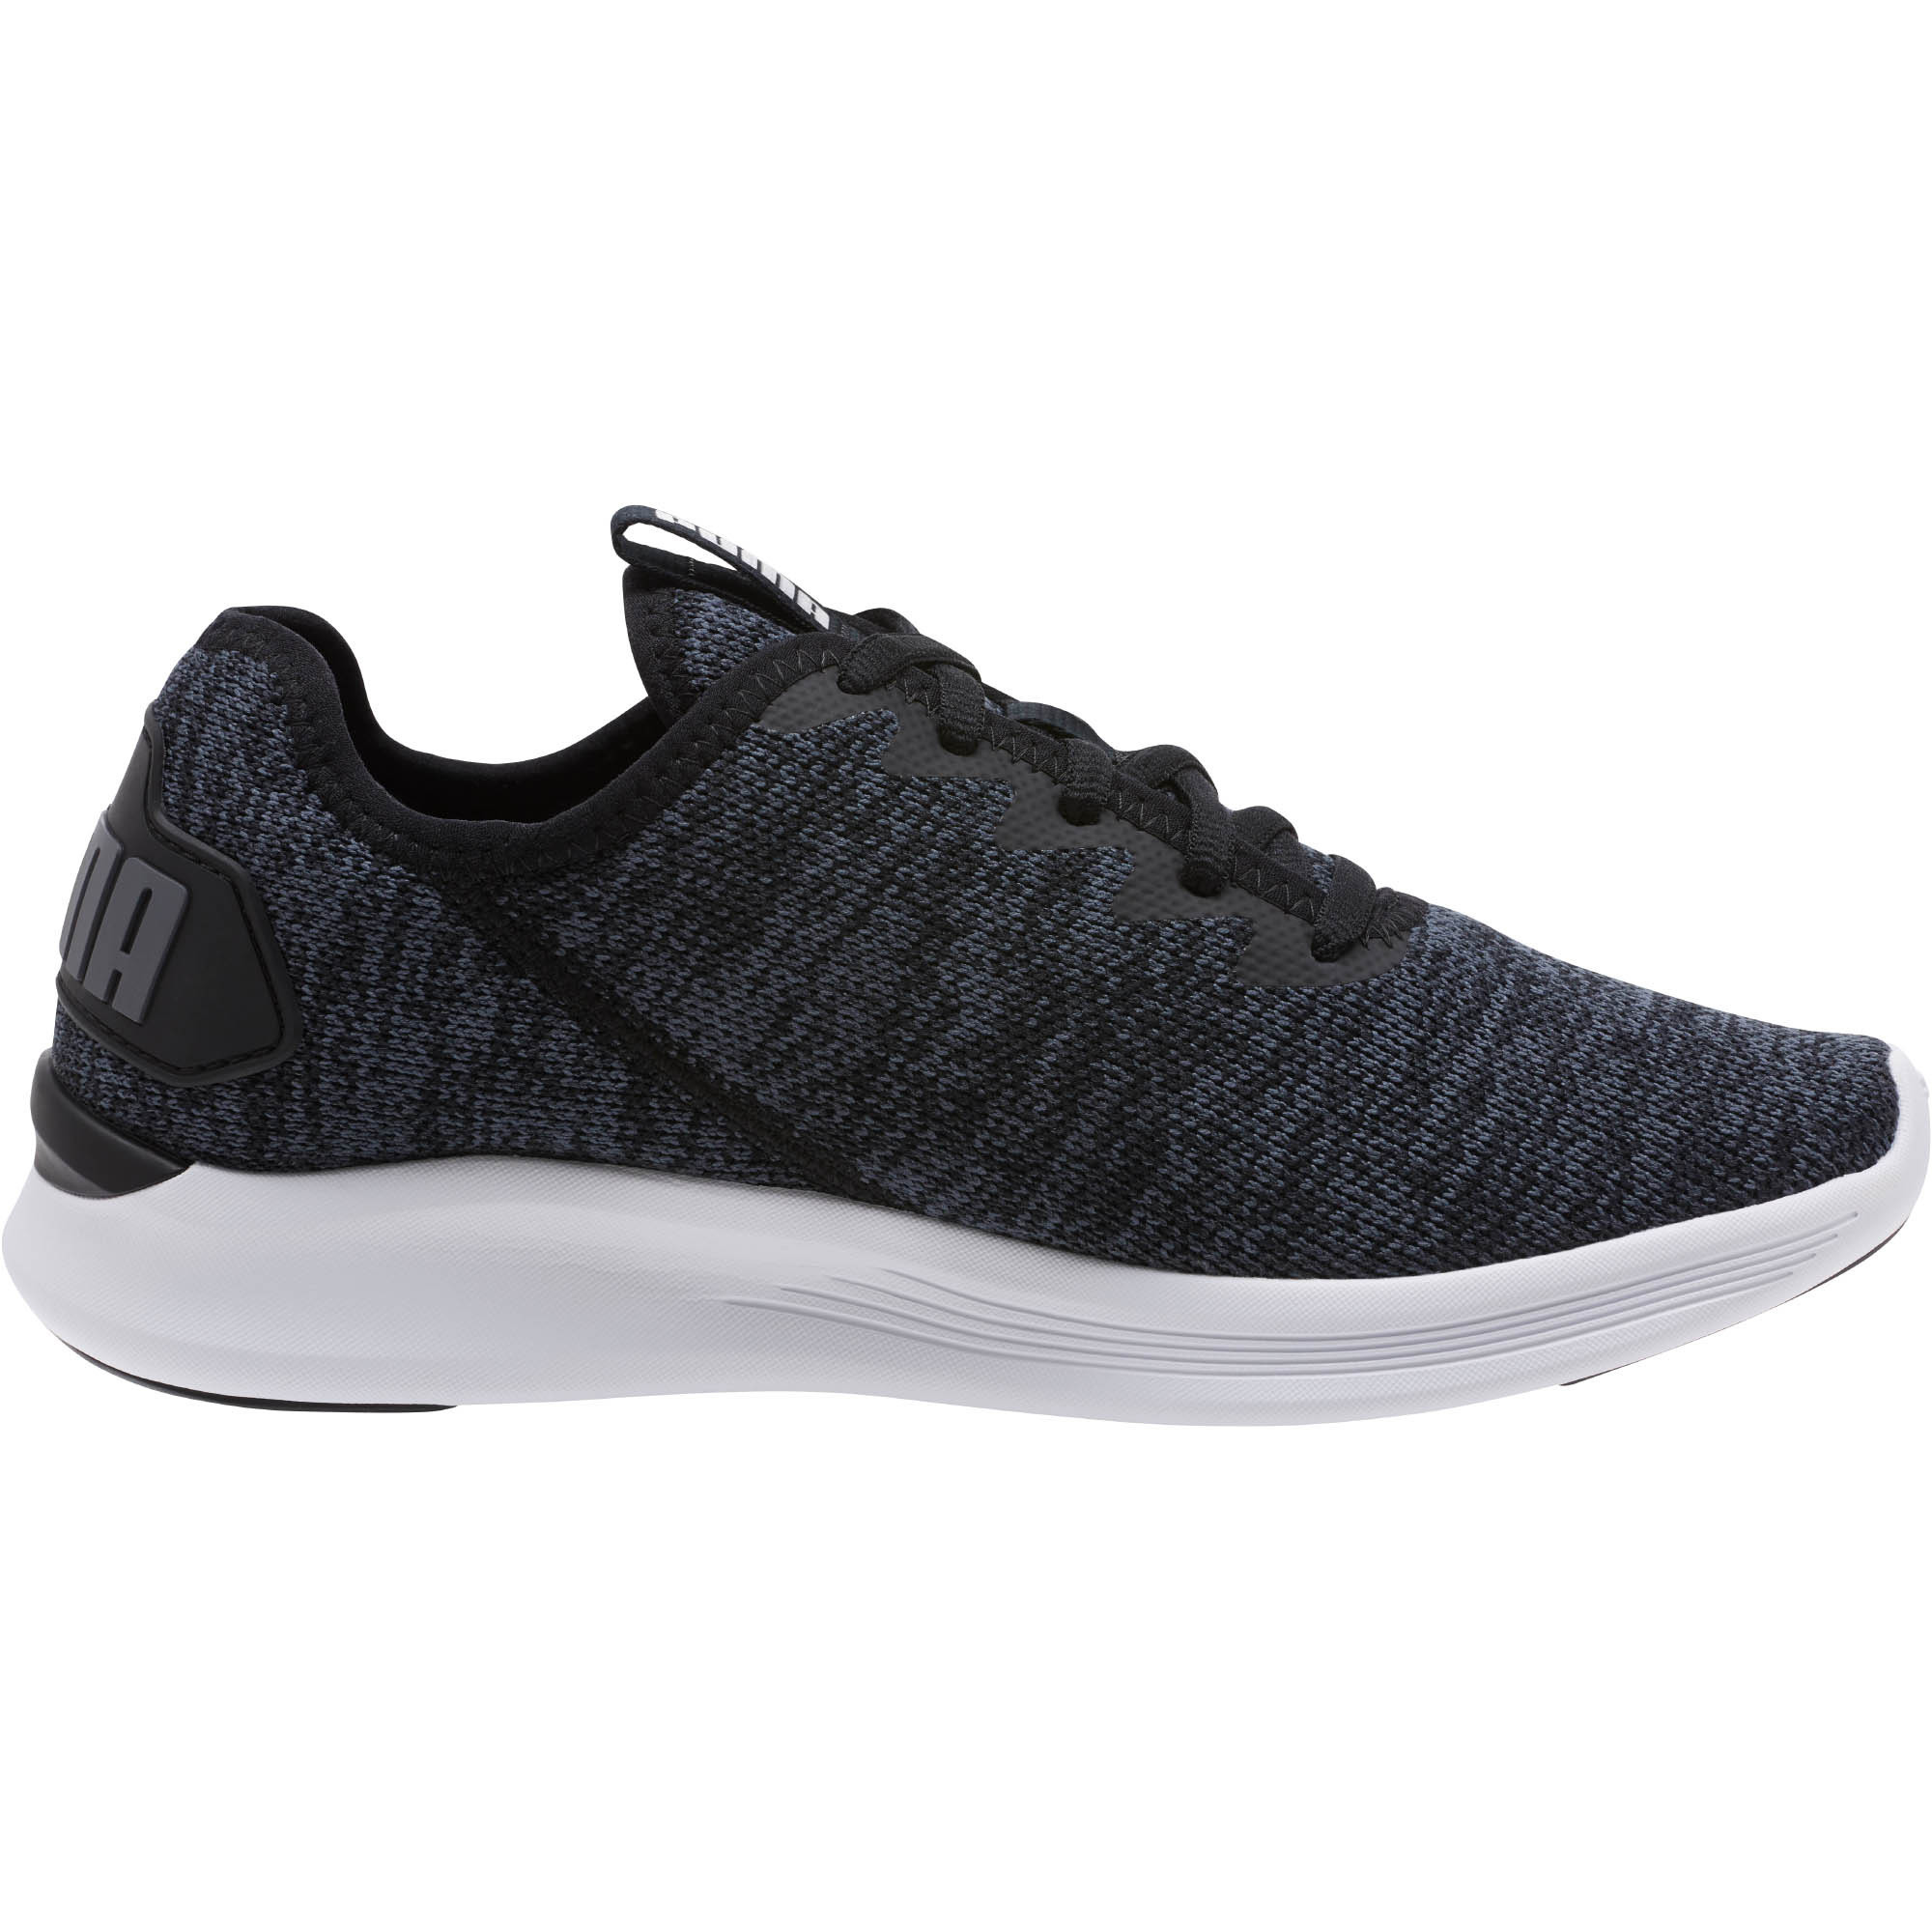 PUMA-Ballast-Women-039-s-Running-Shoes-Women-Shoe-Running thumbnail 5